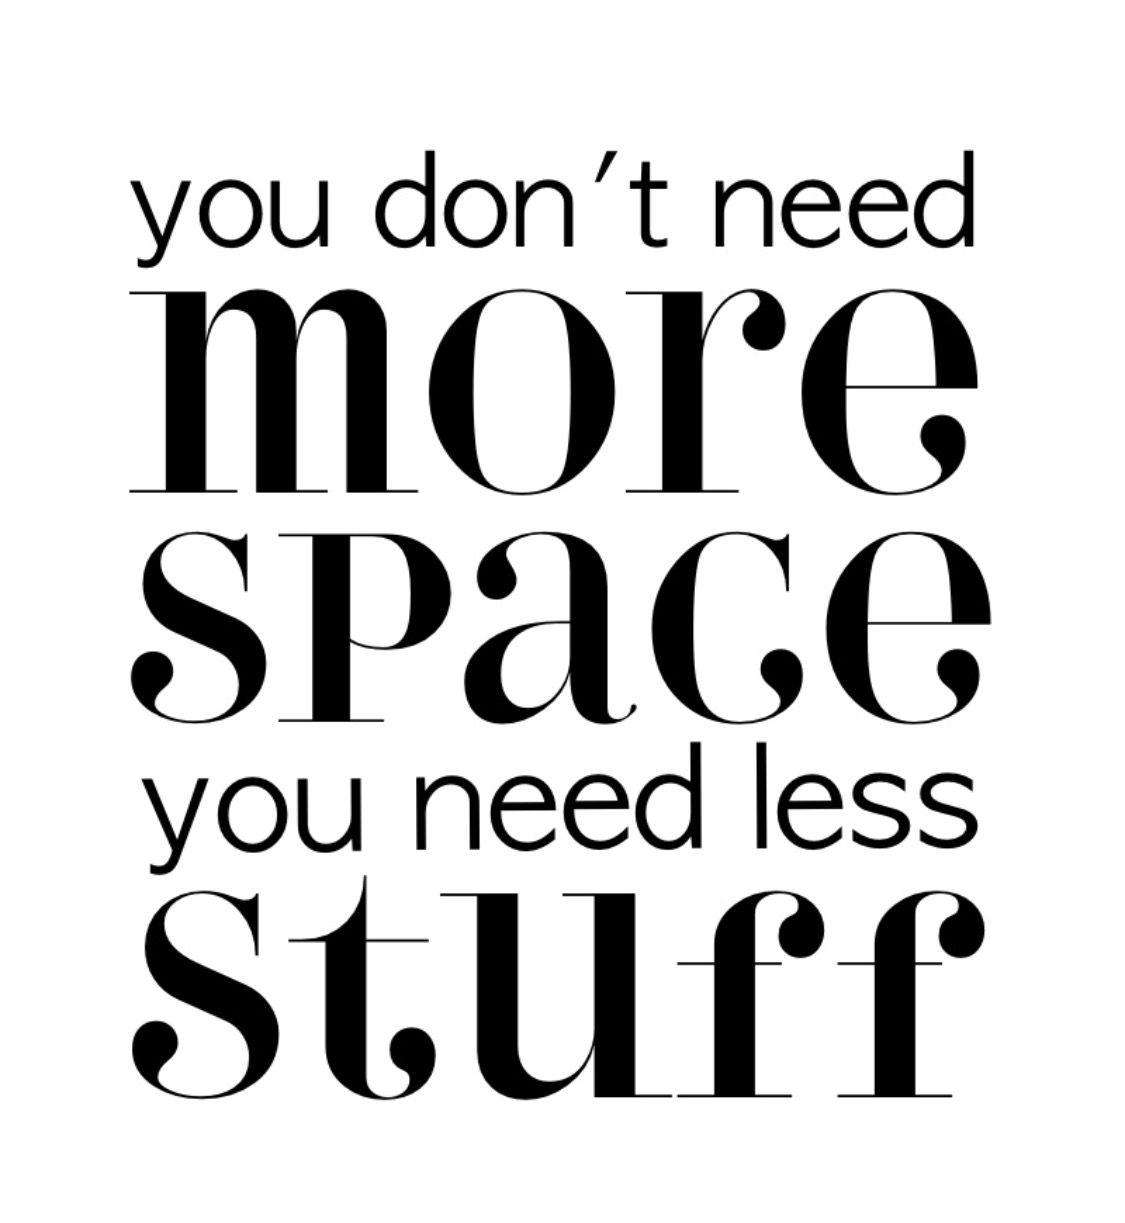 I really do need less stuff. Ok. Why then do I keep buying